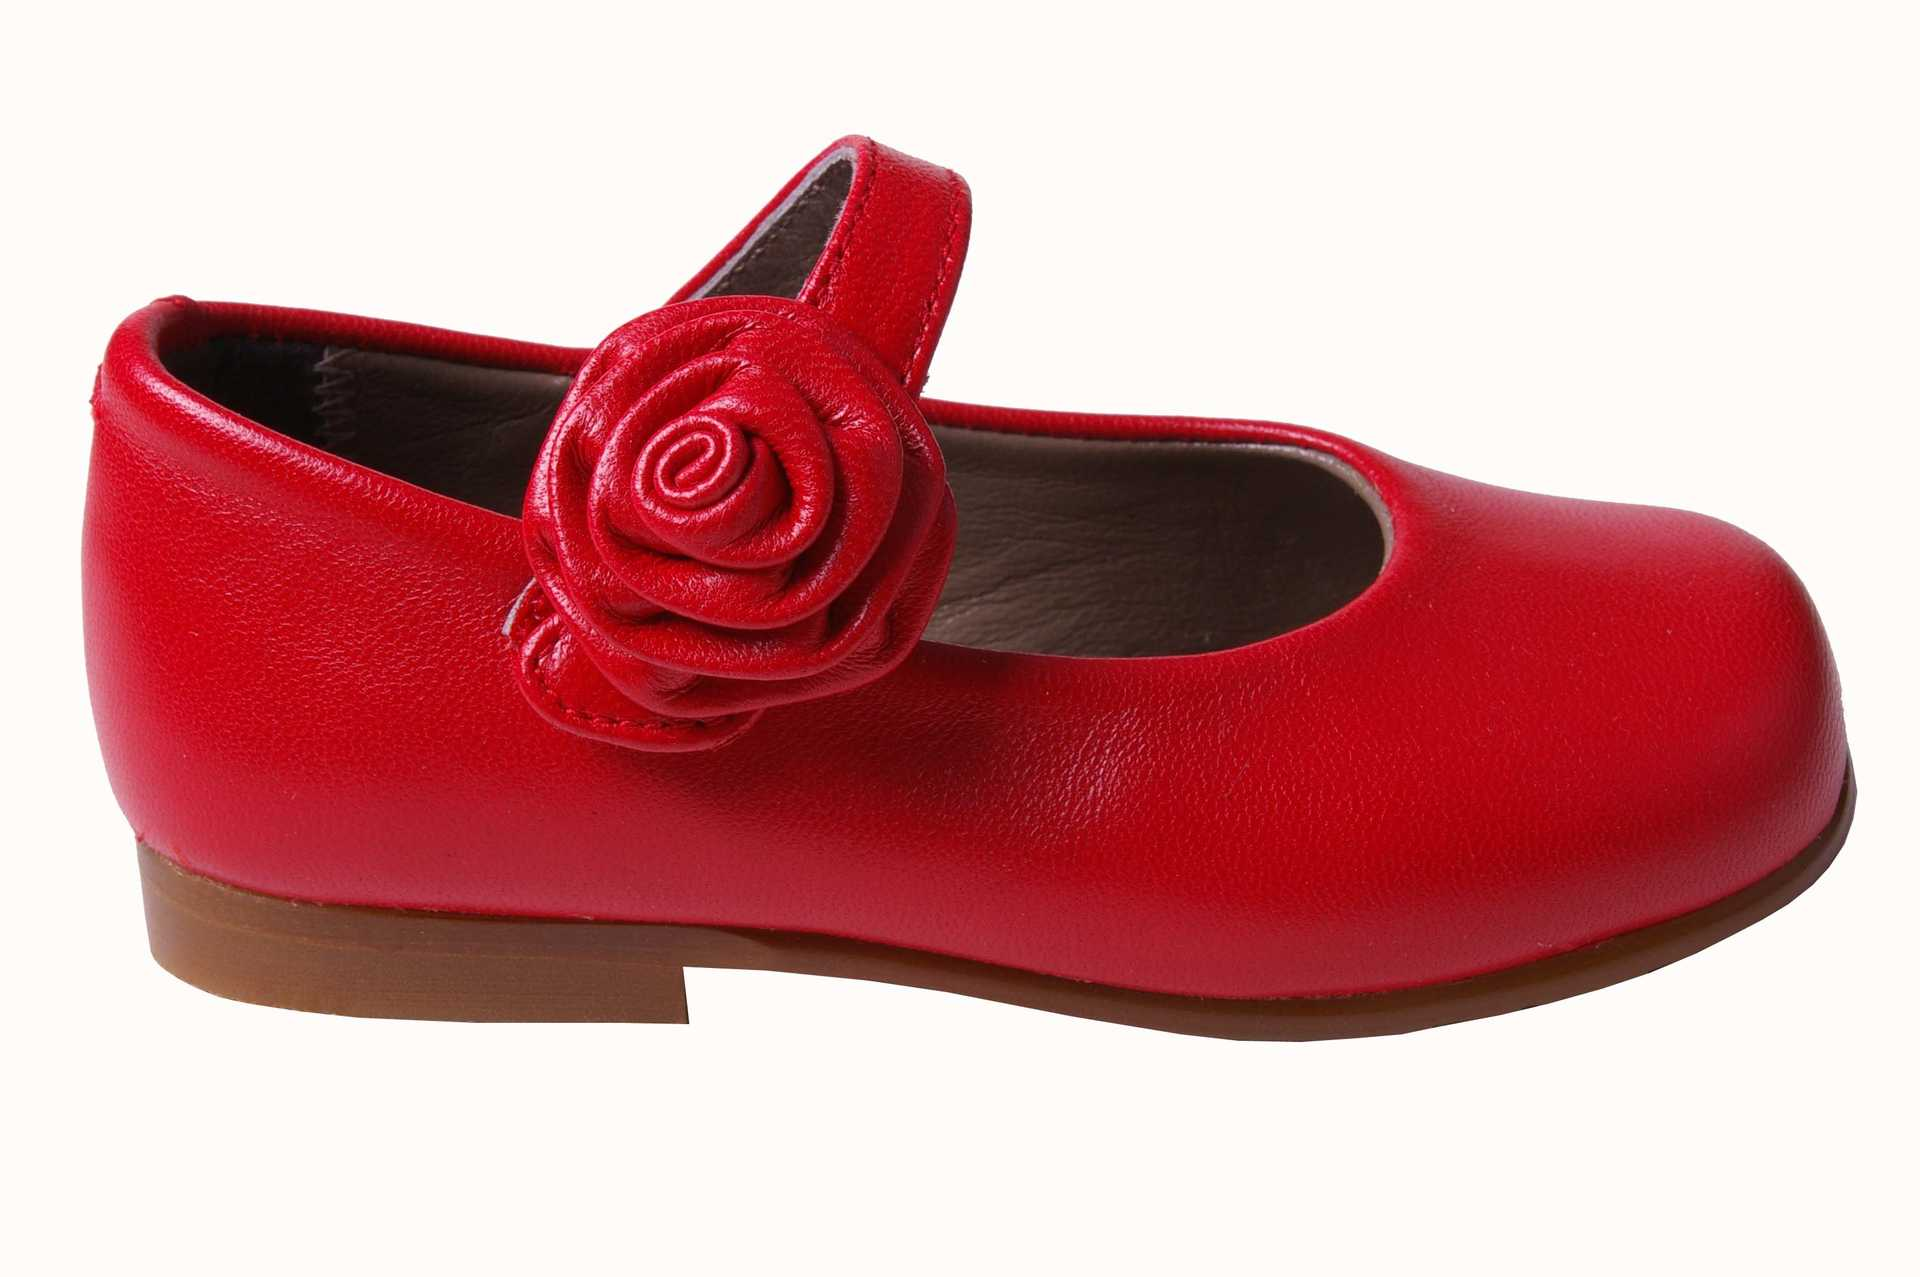 VILLENA'S FOOTWEAR